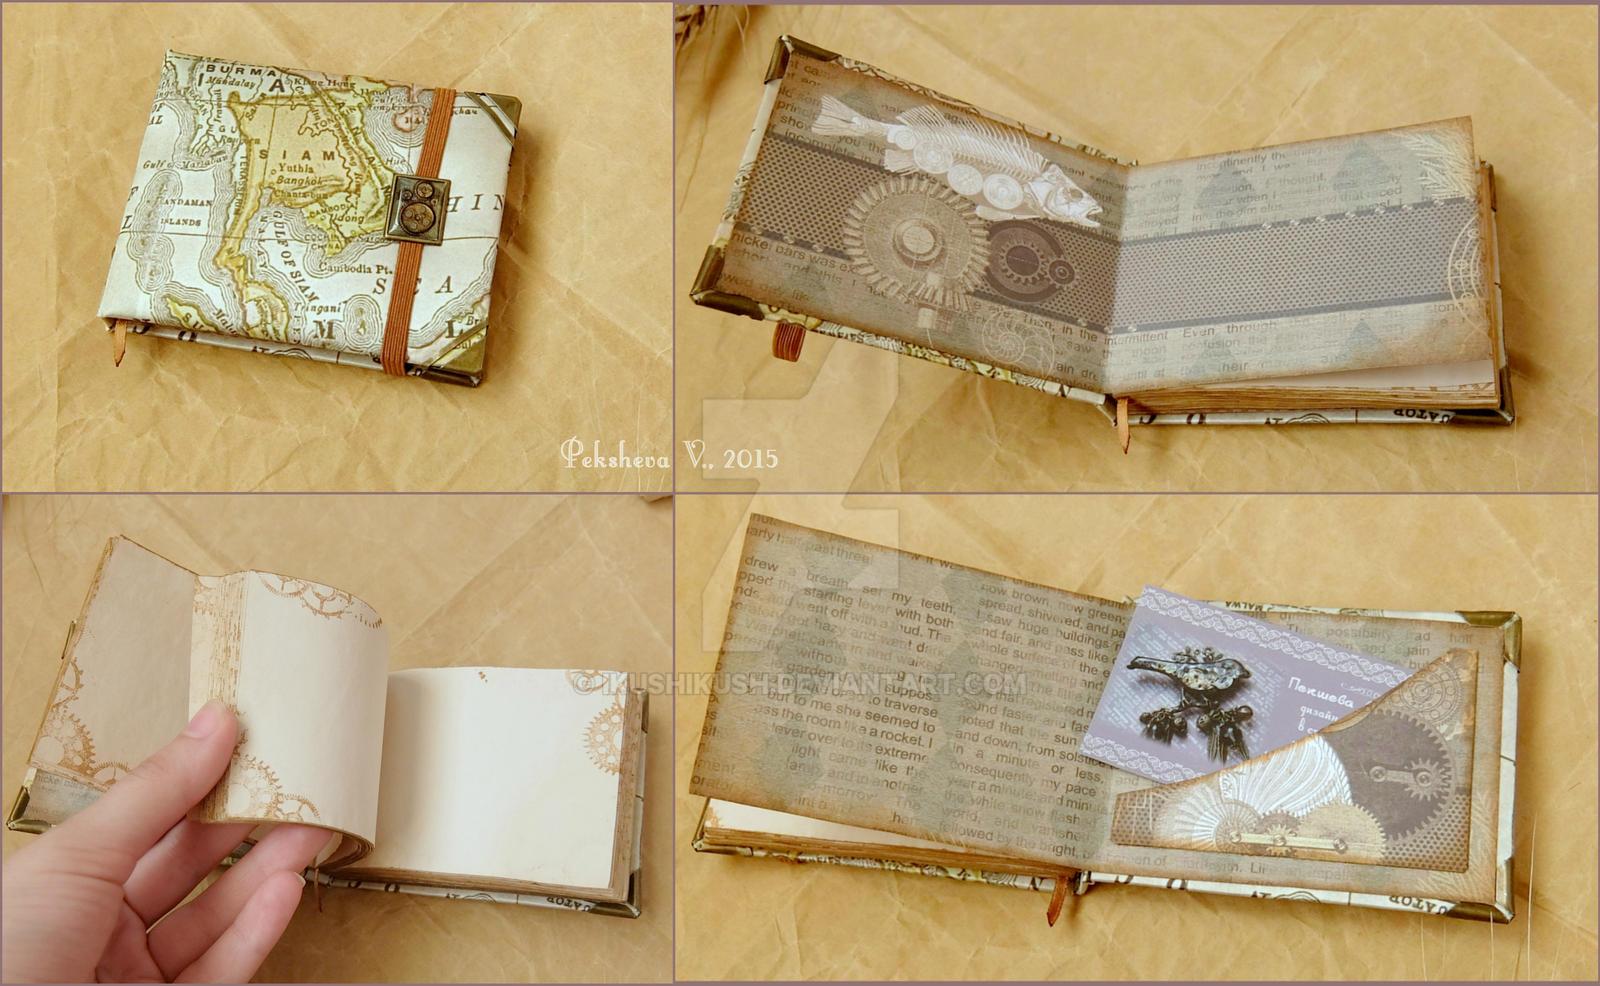 One more steampunk notebook/sketchbook by IkushIkush